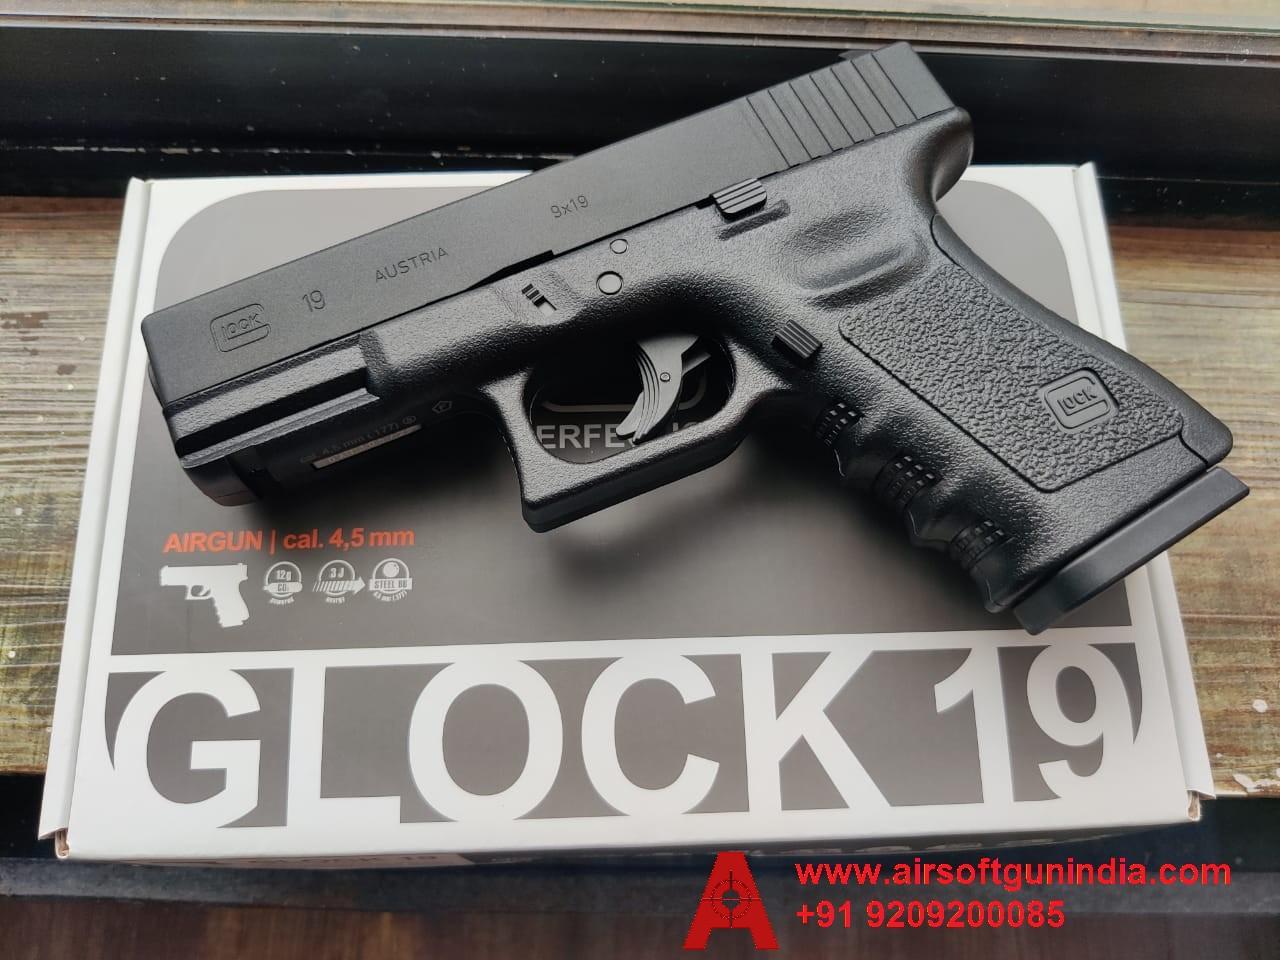 GLOCK 19 .177 CO2 BB NON BLOWBACK AIR PISTOL BY AIRSOFT GUN INDIA